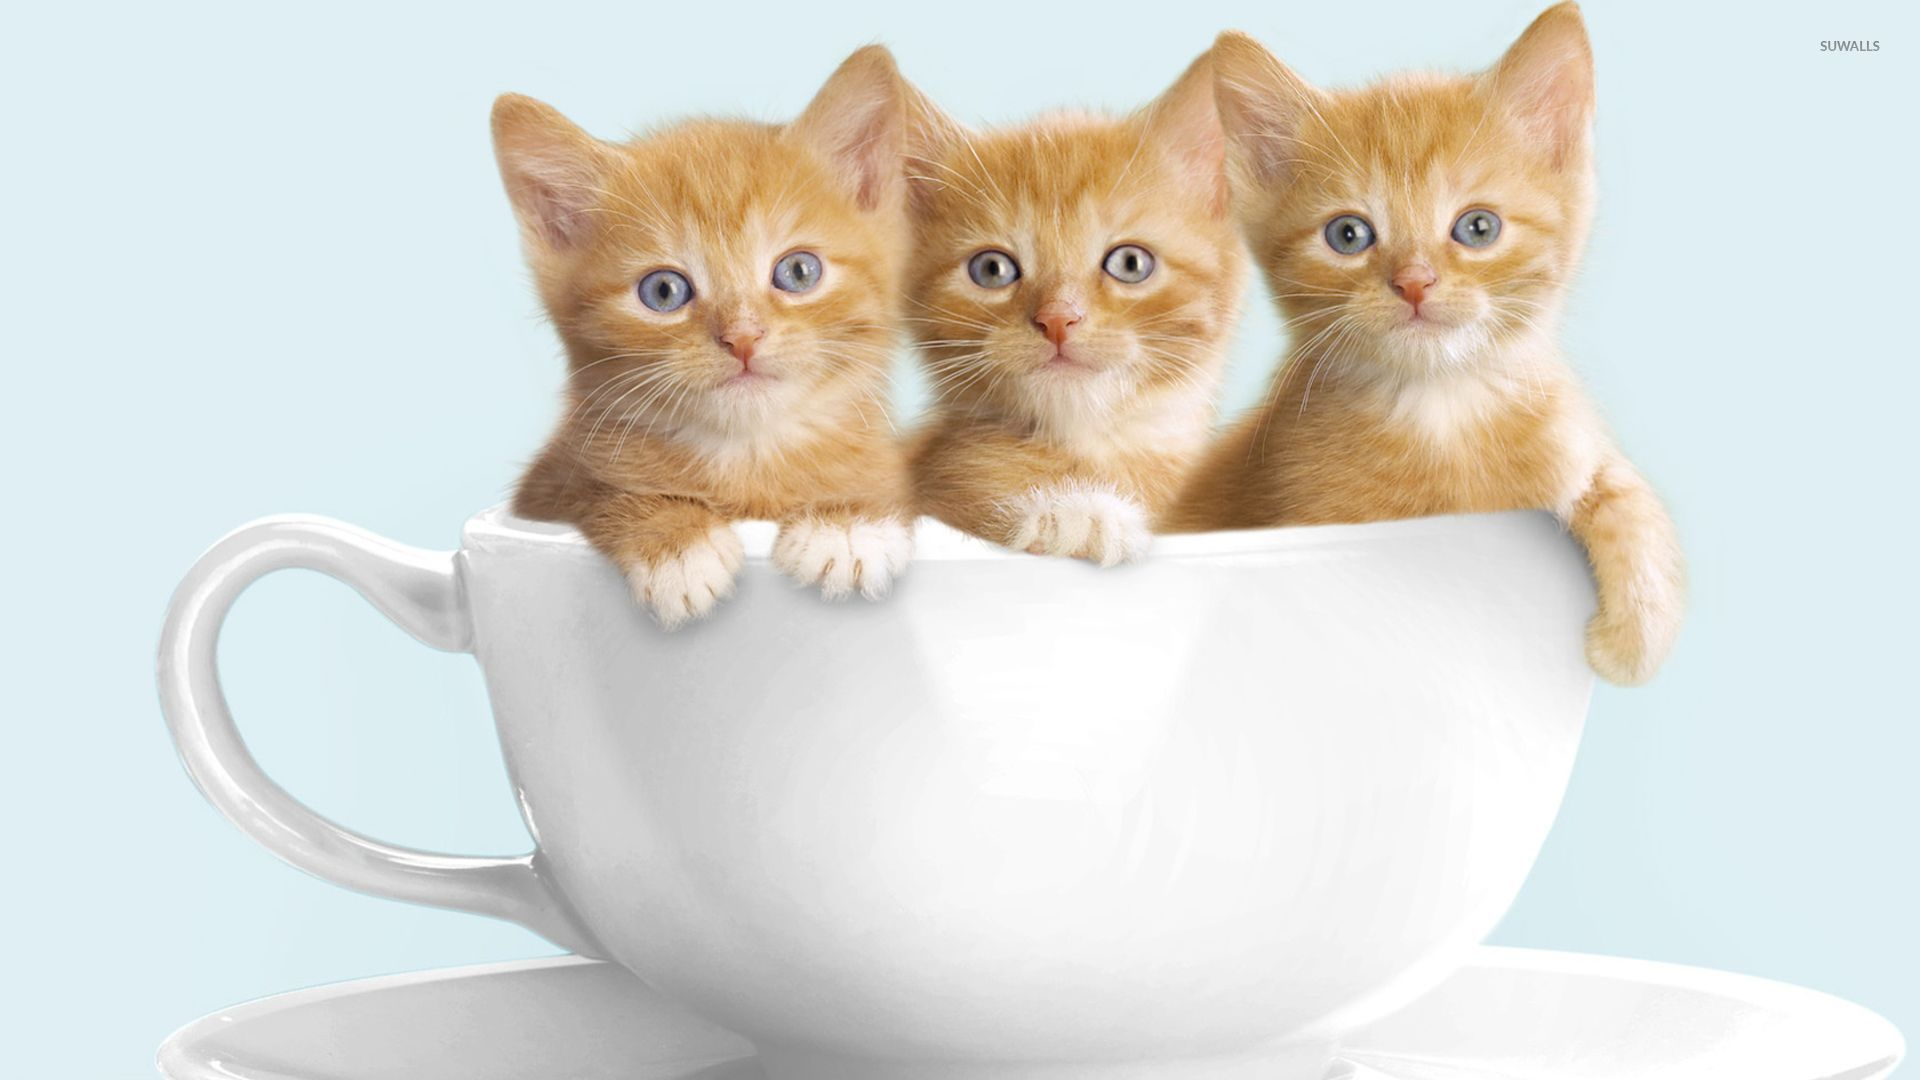 cat years in human years